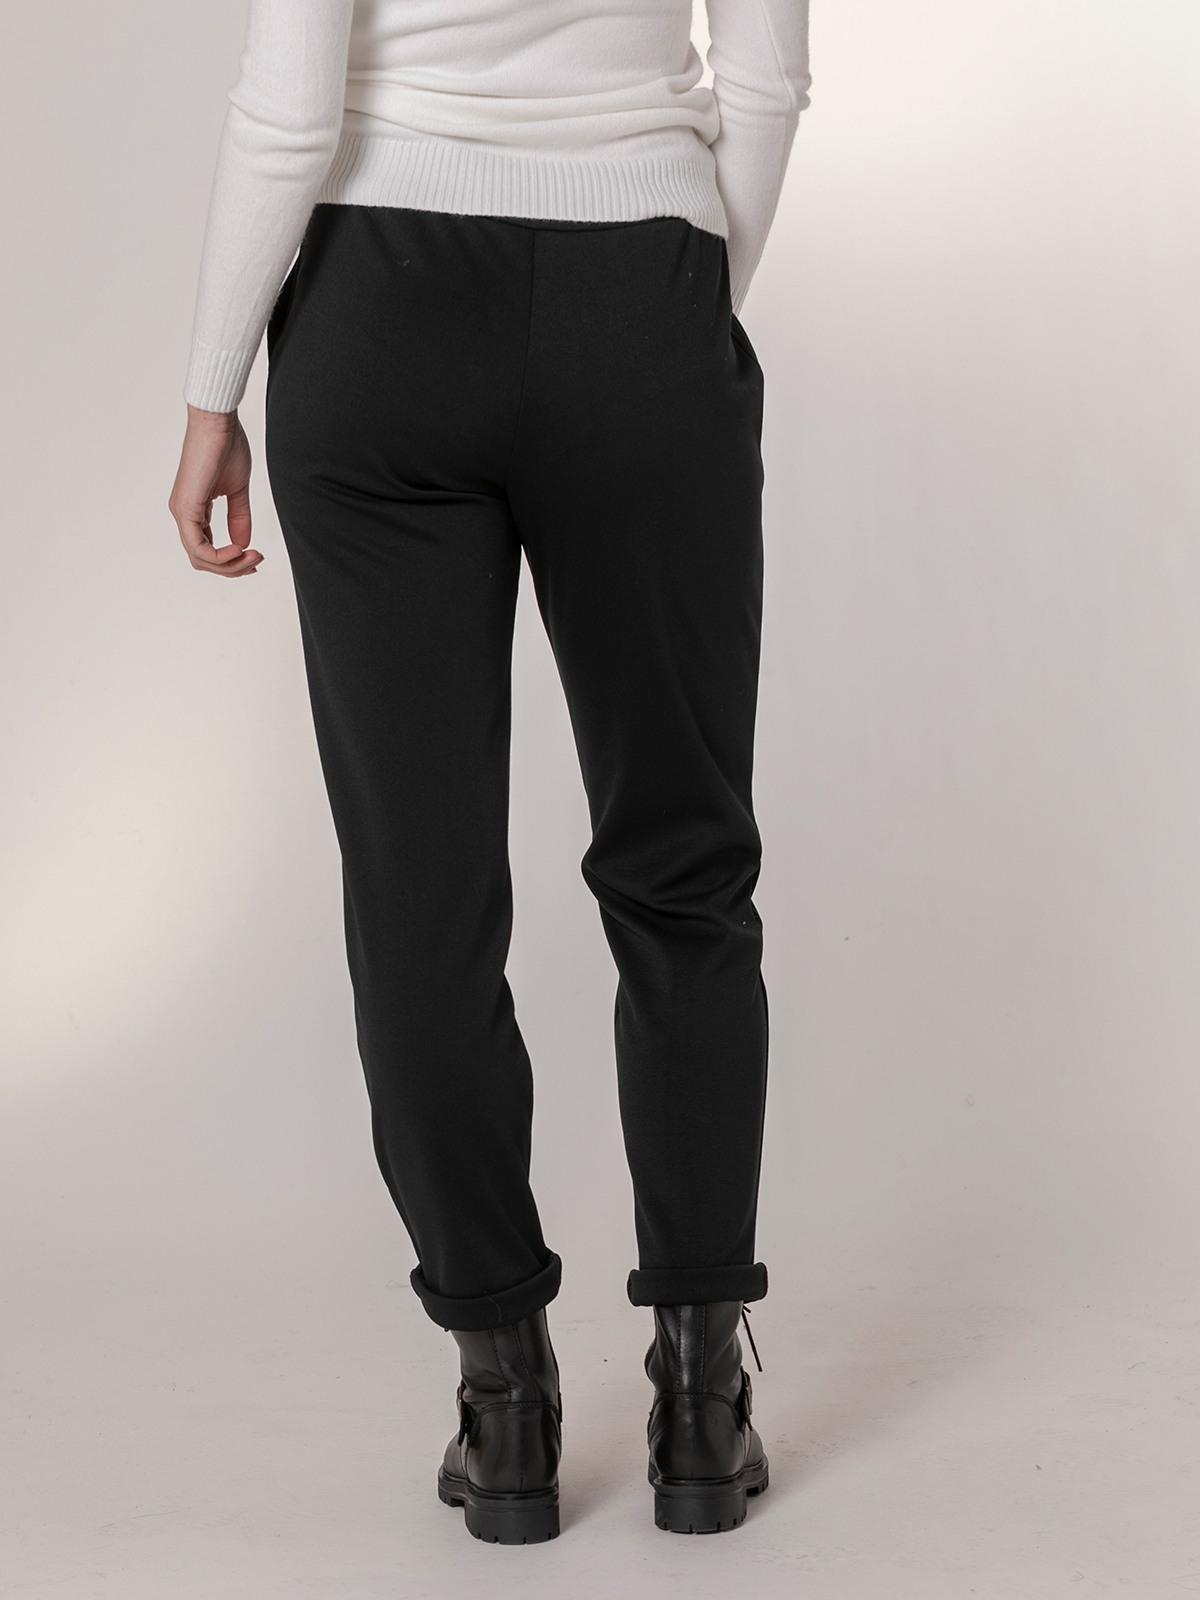 Pantalón mujer casual elástico Negro